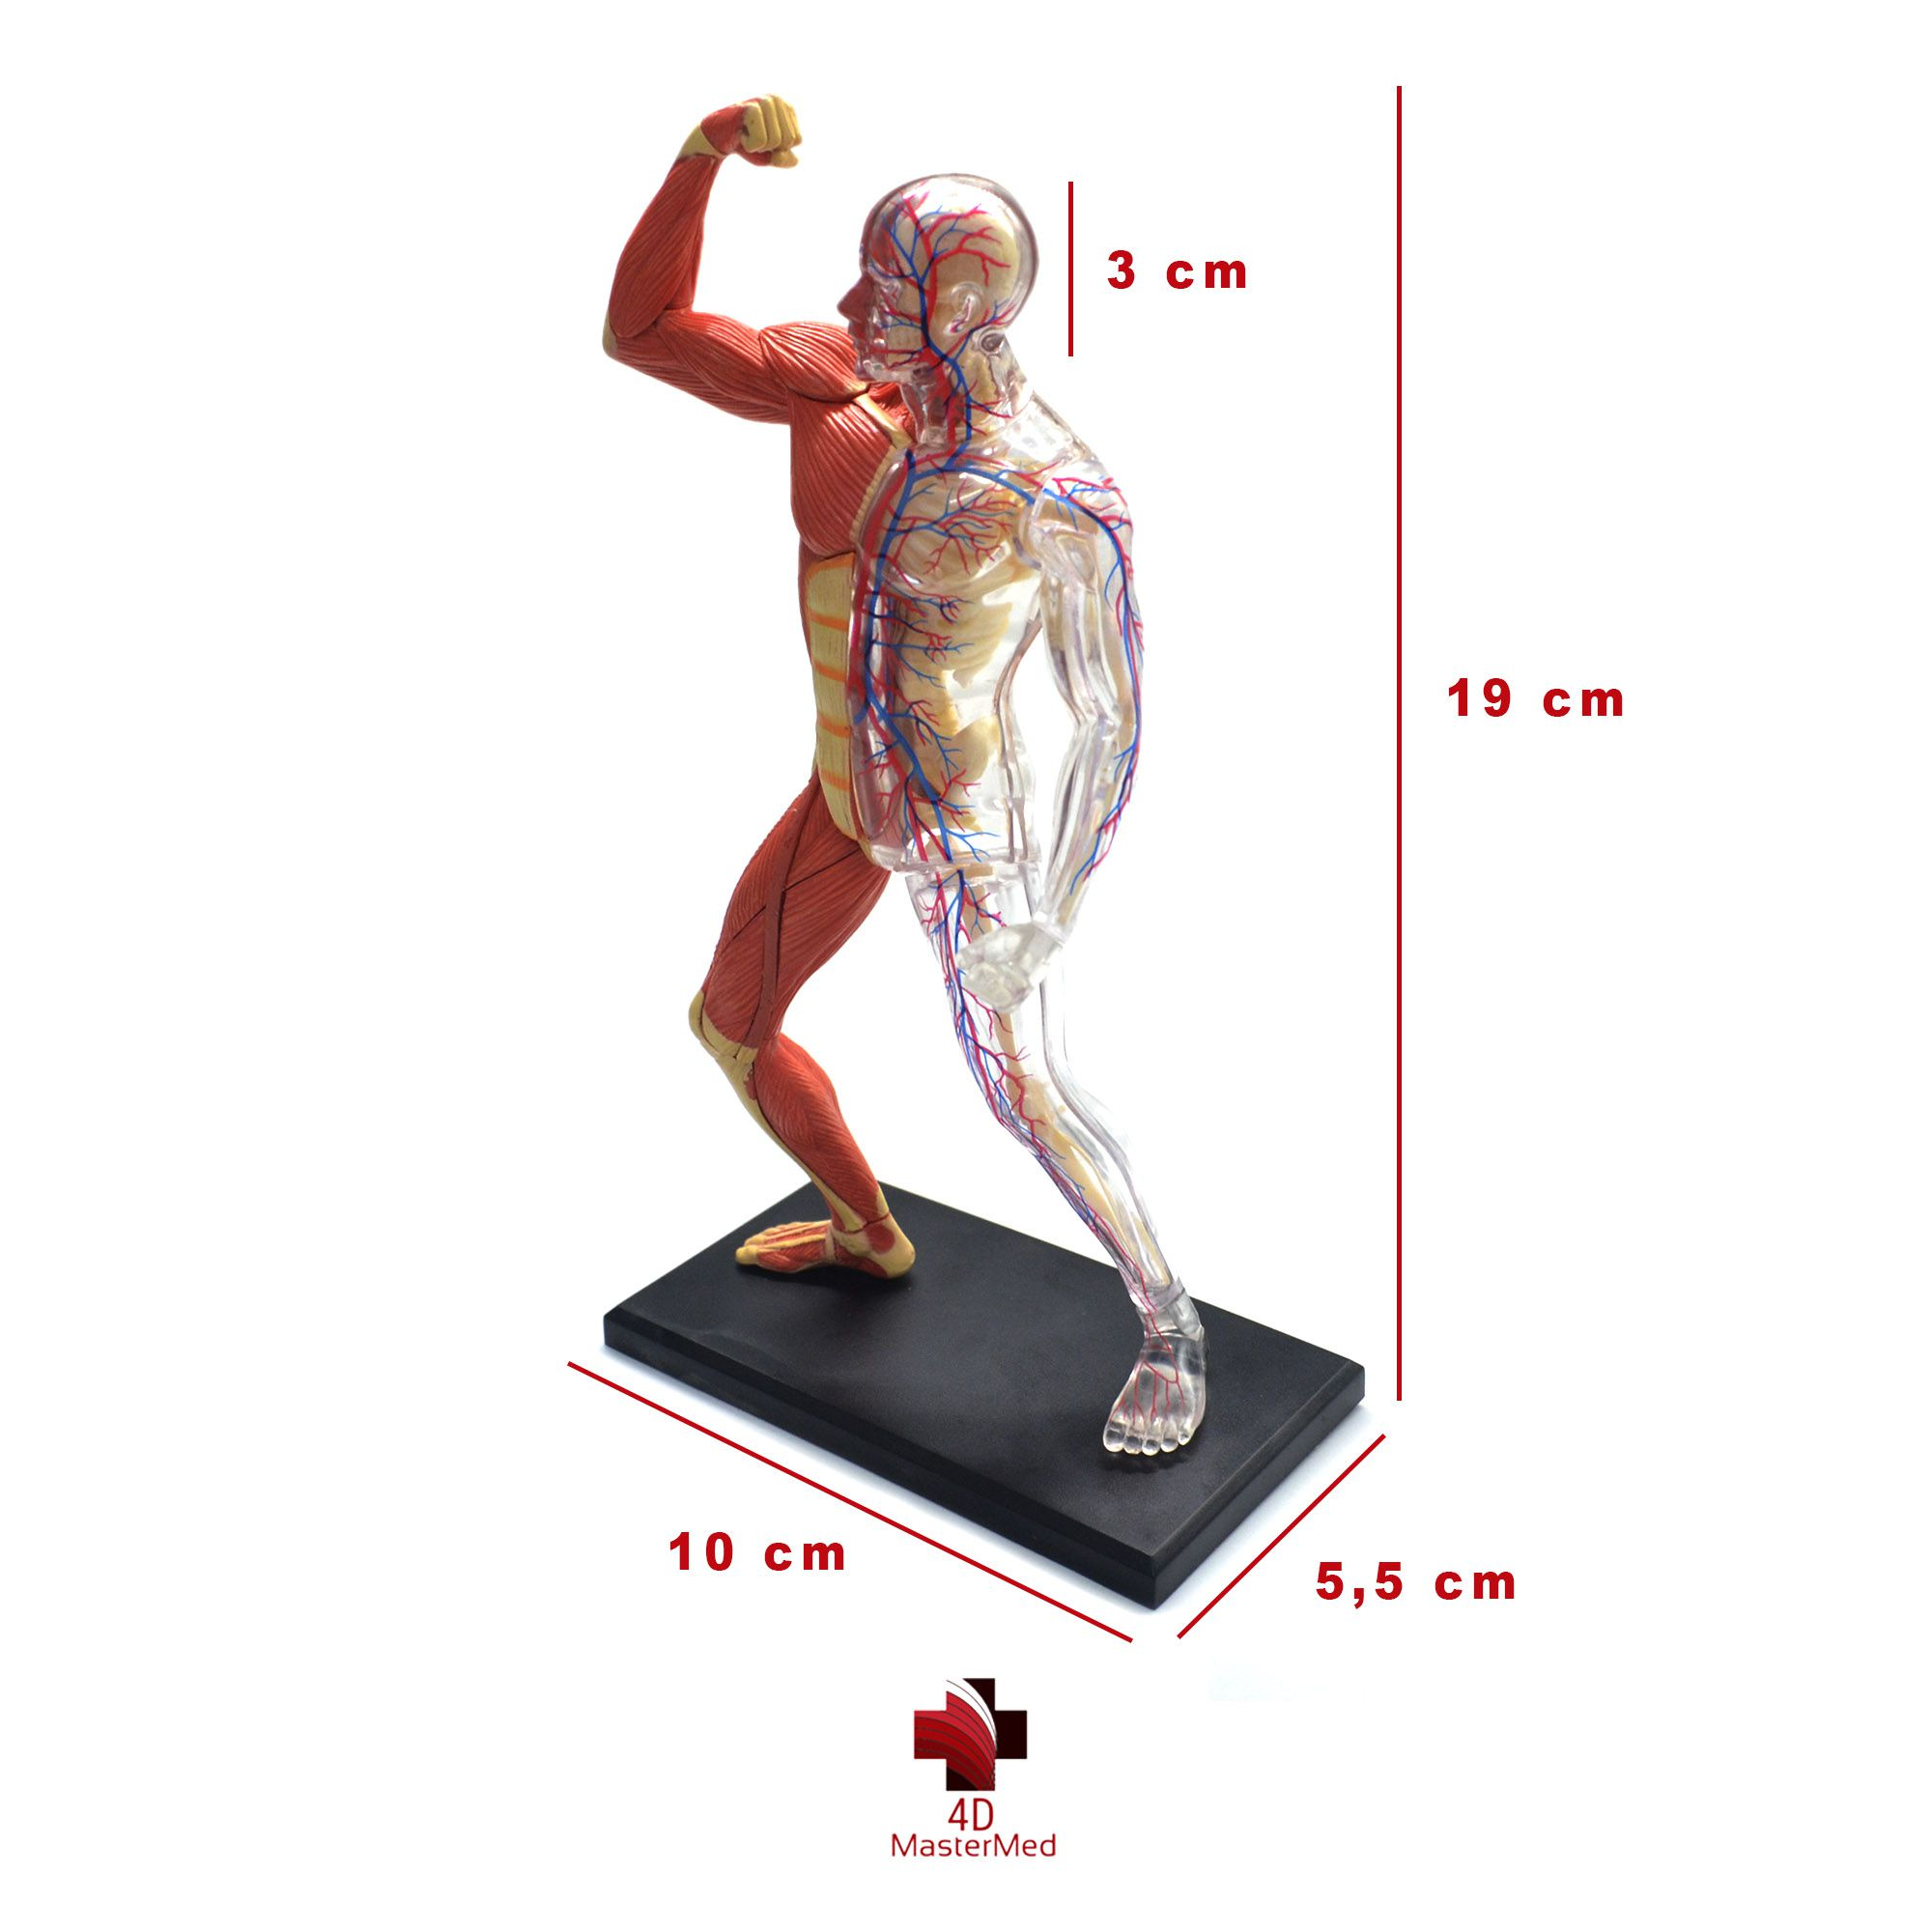 Anatomia do Esqueleto e Músculos Humano